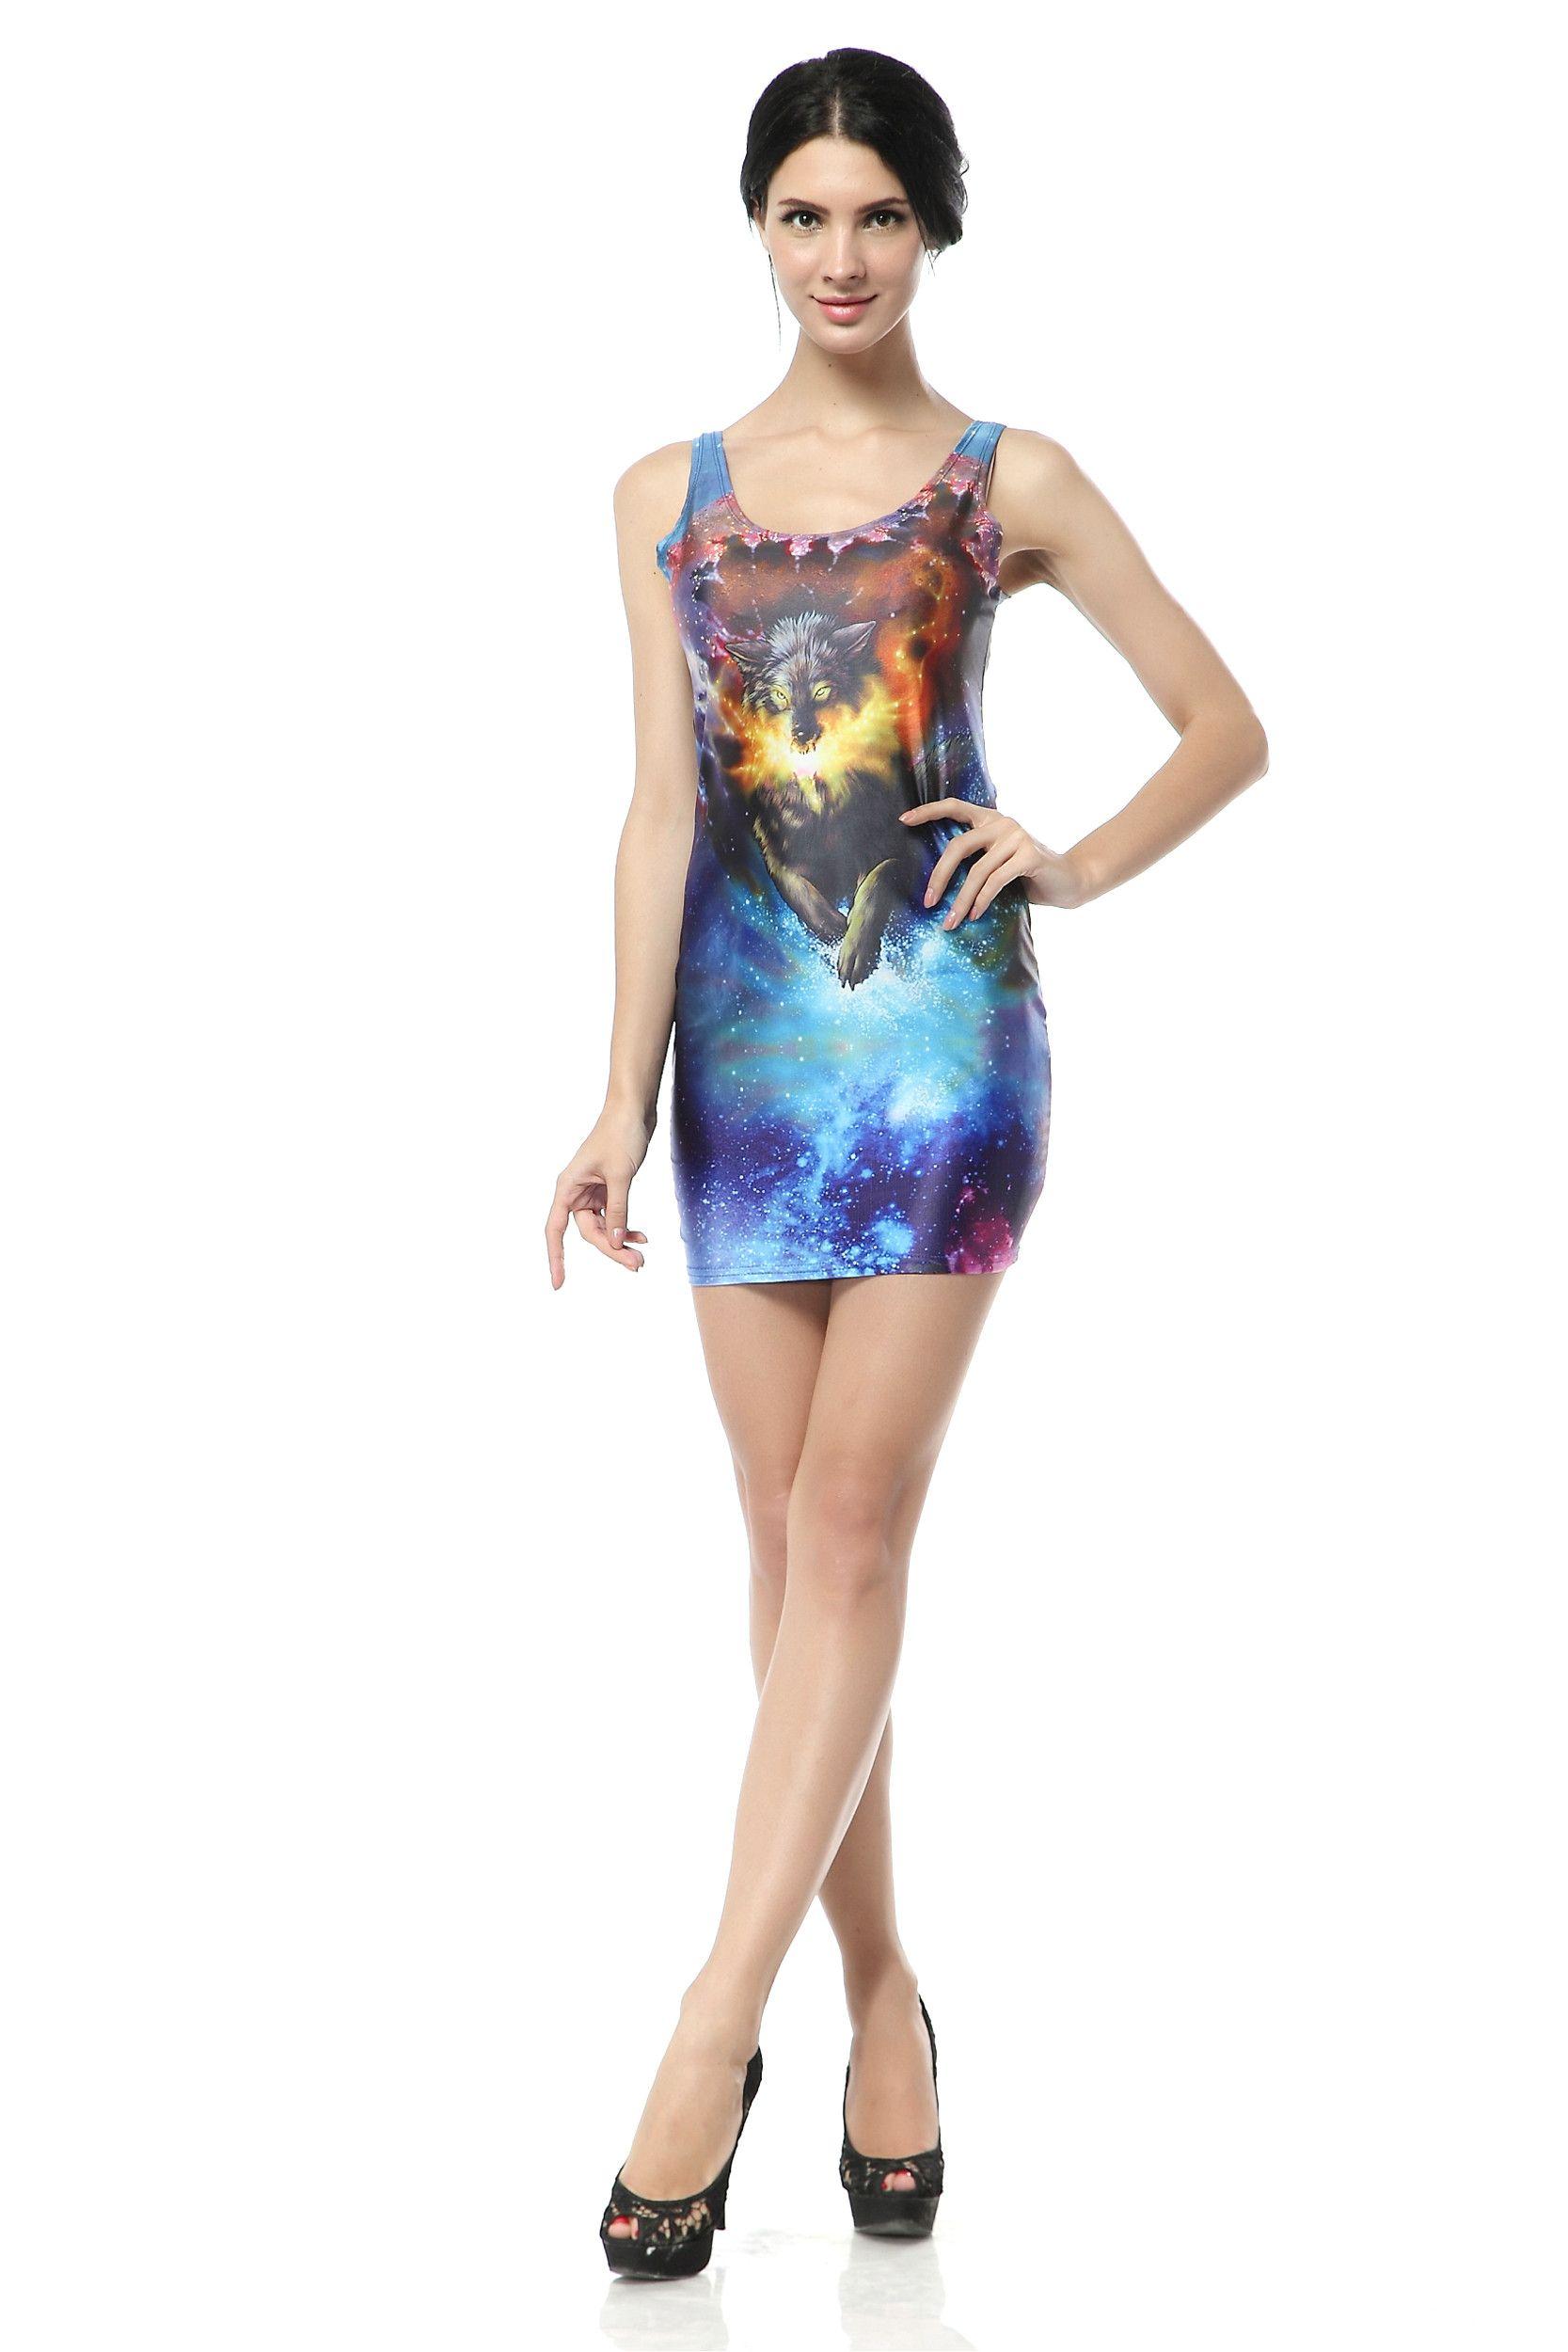 European 2014 Bandage Dress Women Elegant Bodycon Dresses Fashion Patchwork Embroidery Dress Autumn Knee Length Bodycon